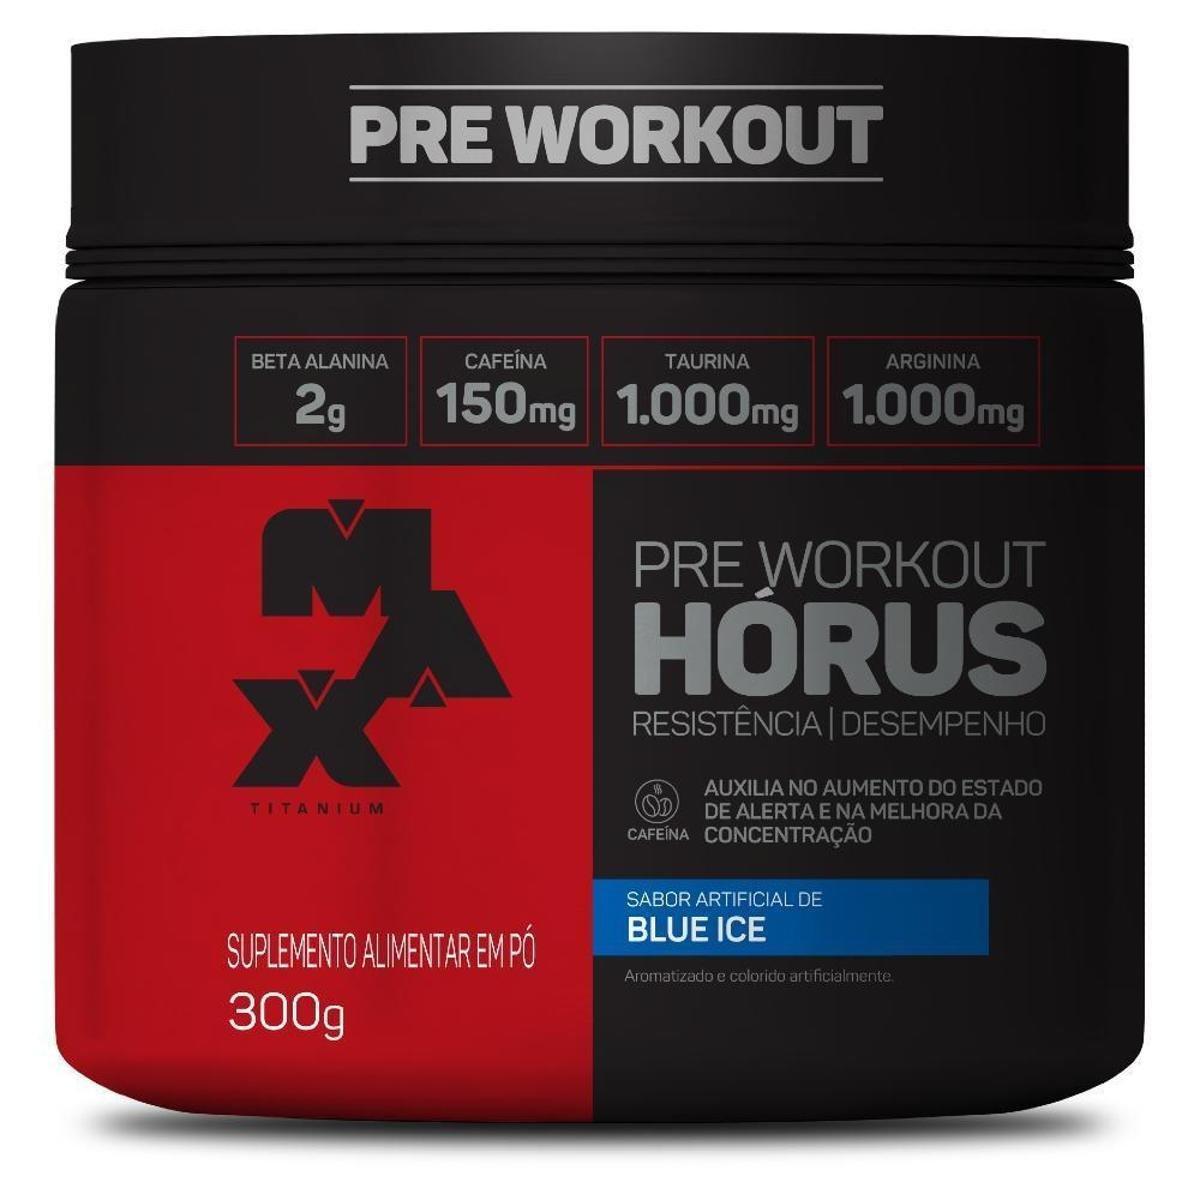 HORUS PRE - WORKOUT (300G) - MAX TITANIUM